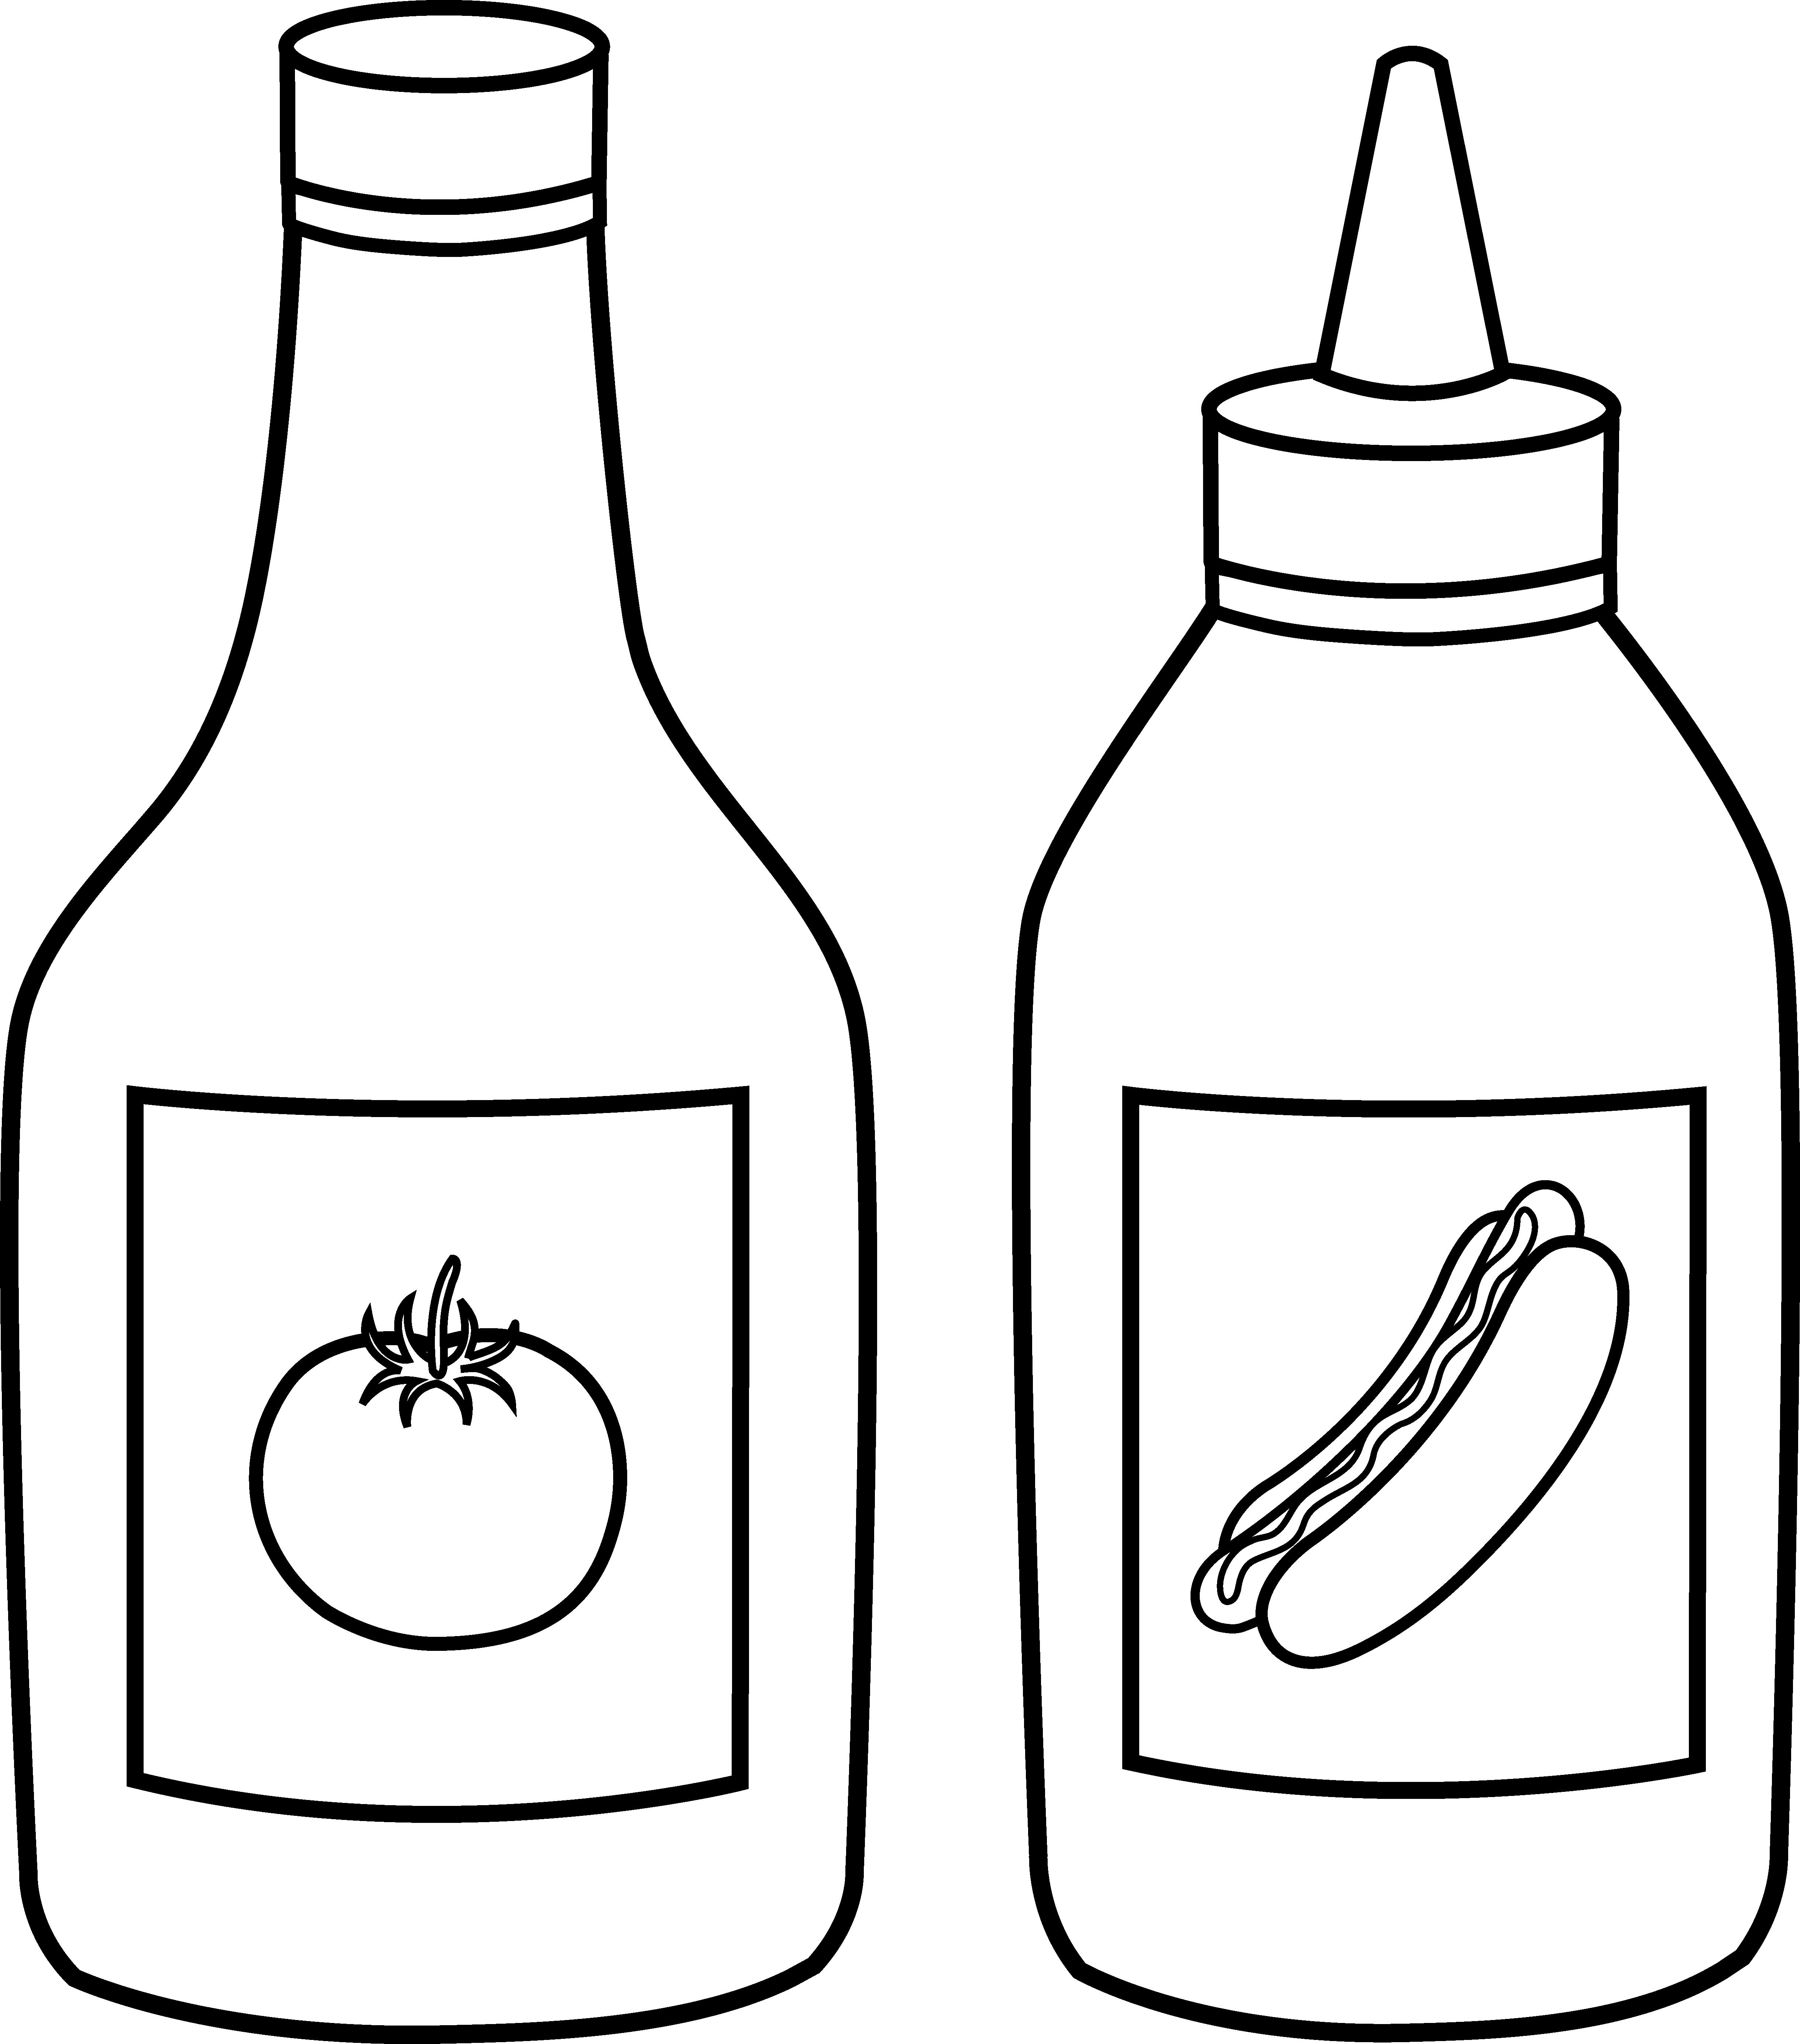 clip art royalty free library Ketchup clipart generic. Clip art frames illustrations.